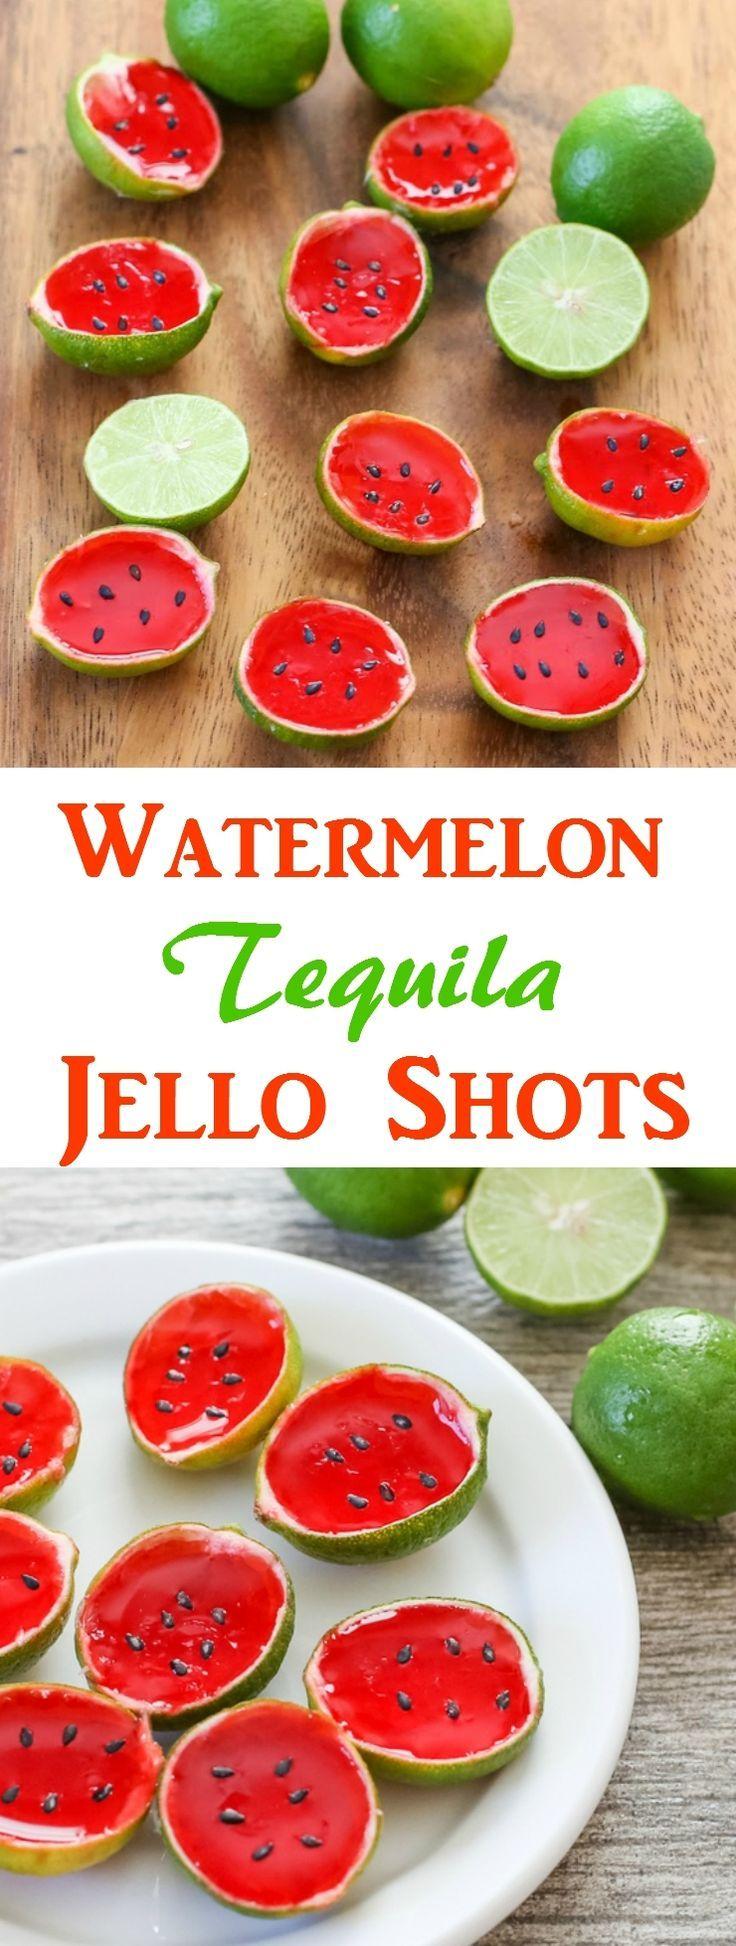 Watermelon Tequila Jello Shots | Kirbie's Cravings | A San Diego food & travel blog